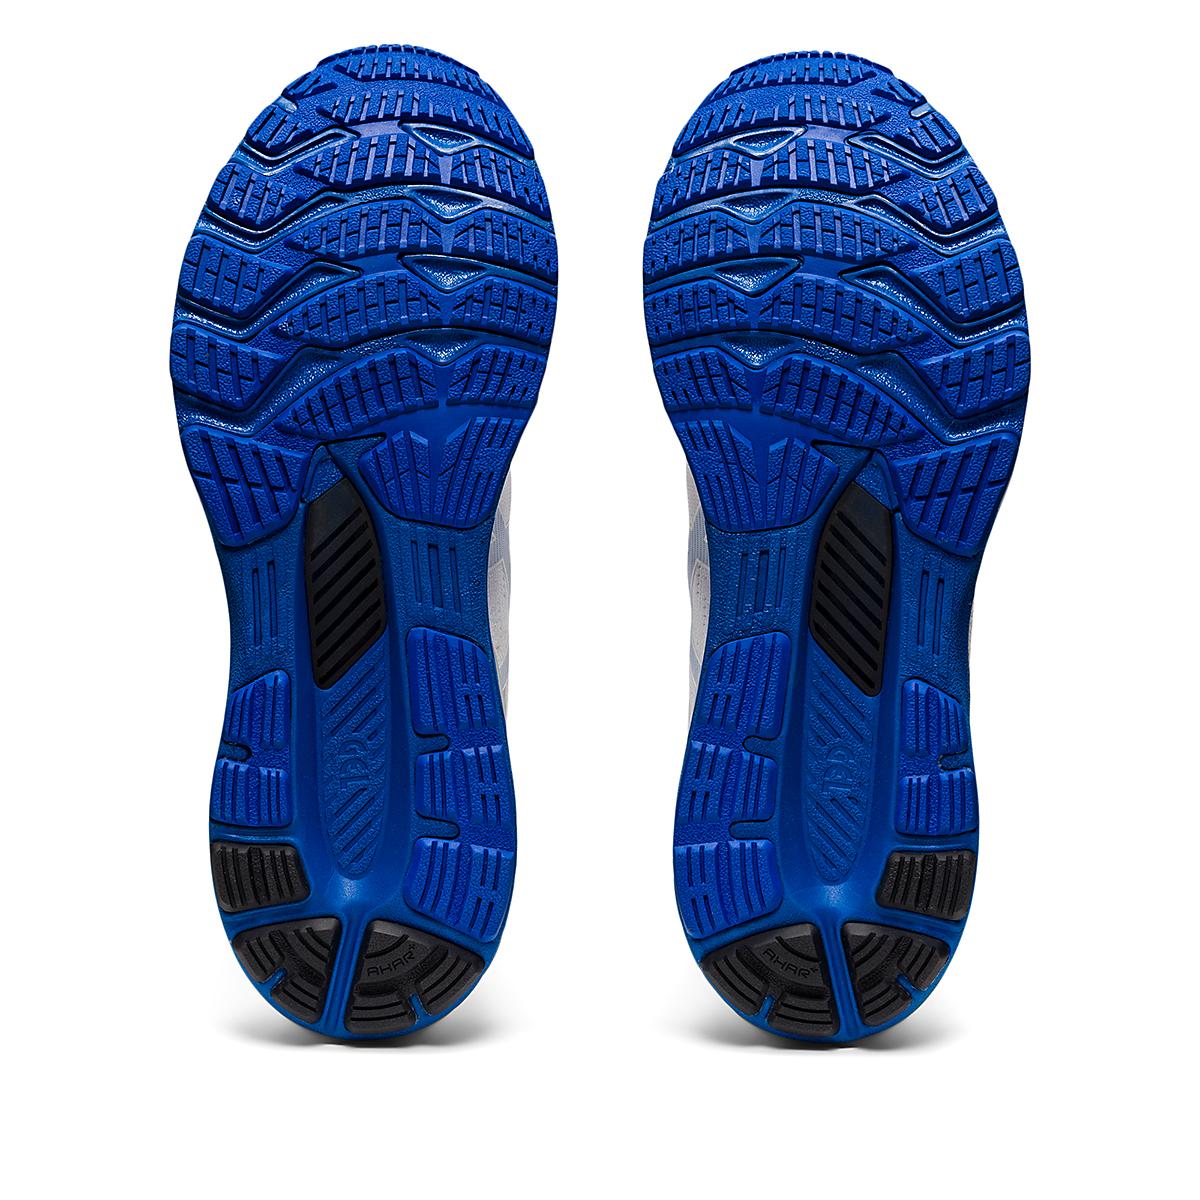 Men's Asics Gel-Kayano 28 Running Shoe - Color: White/Tuna Blue - JackRabbit Exclusive - Size: 6.5 - Width: Regular, White/Tuna Blue - JackRabbit Exclusive, large, image 7